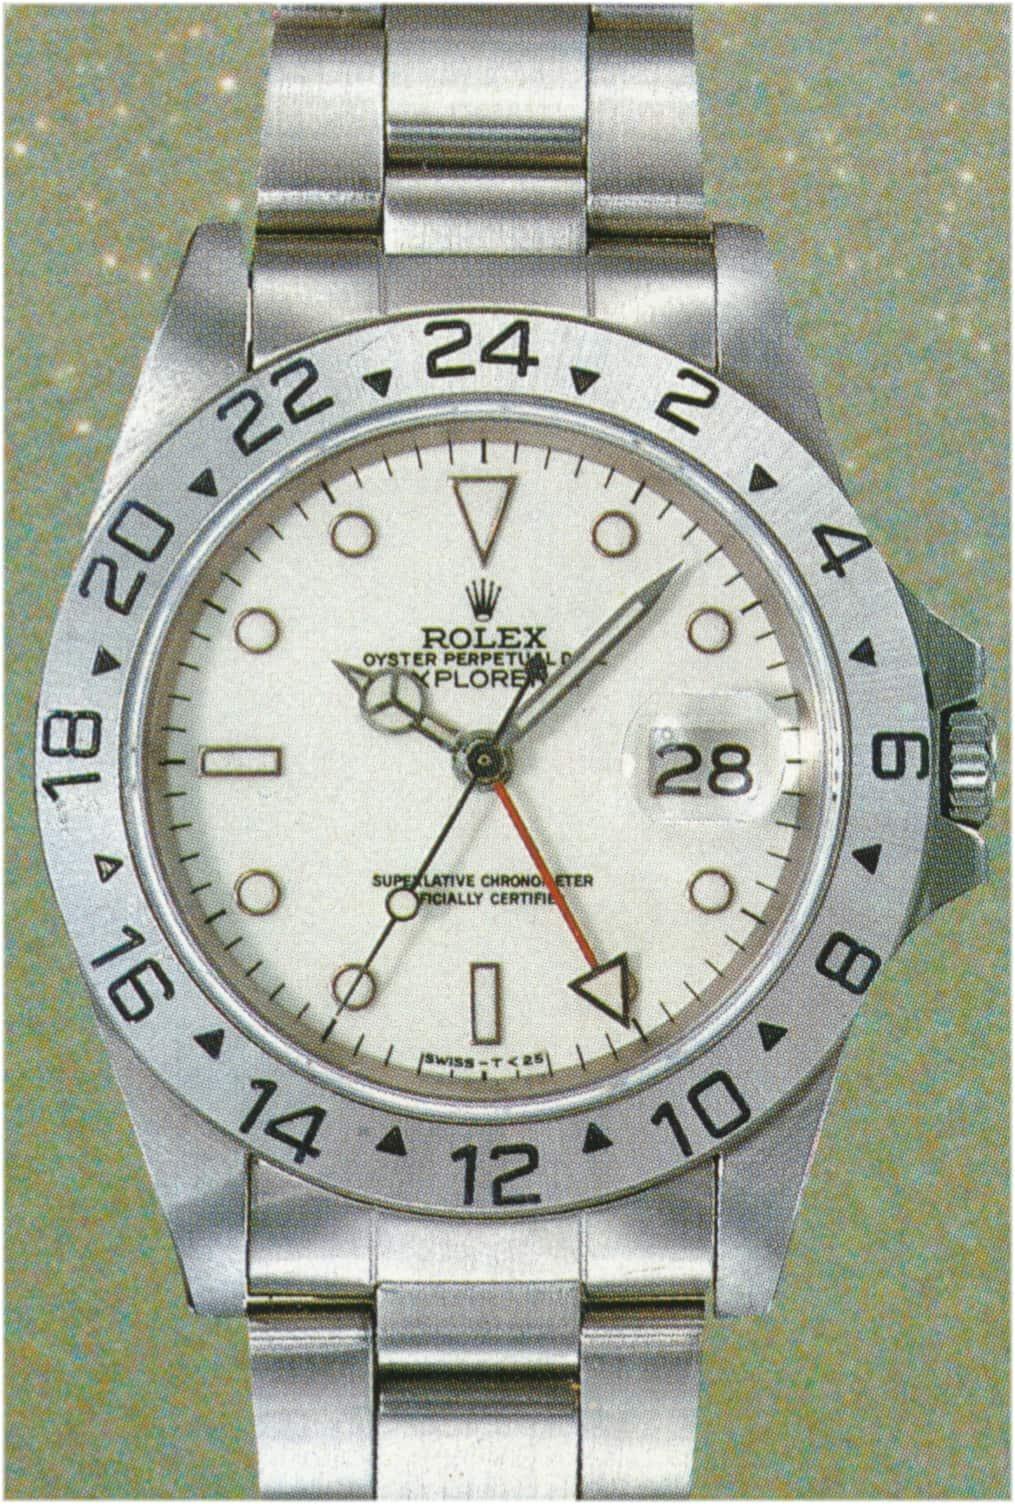 Rolex Explorer II Referenz 16550 Tritium Zifferblatt